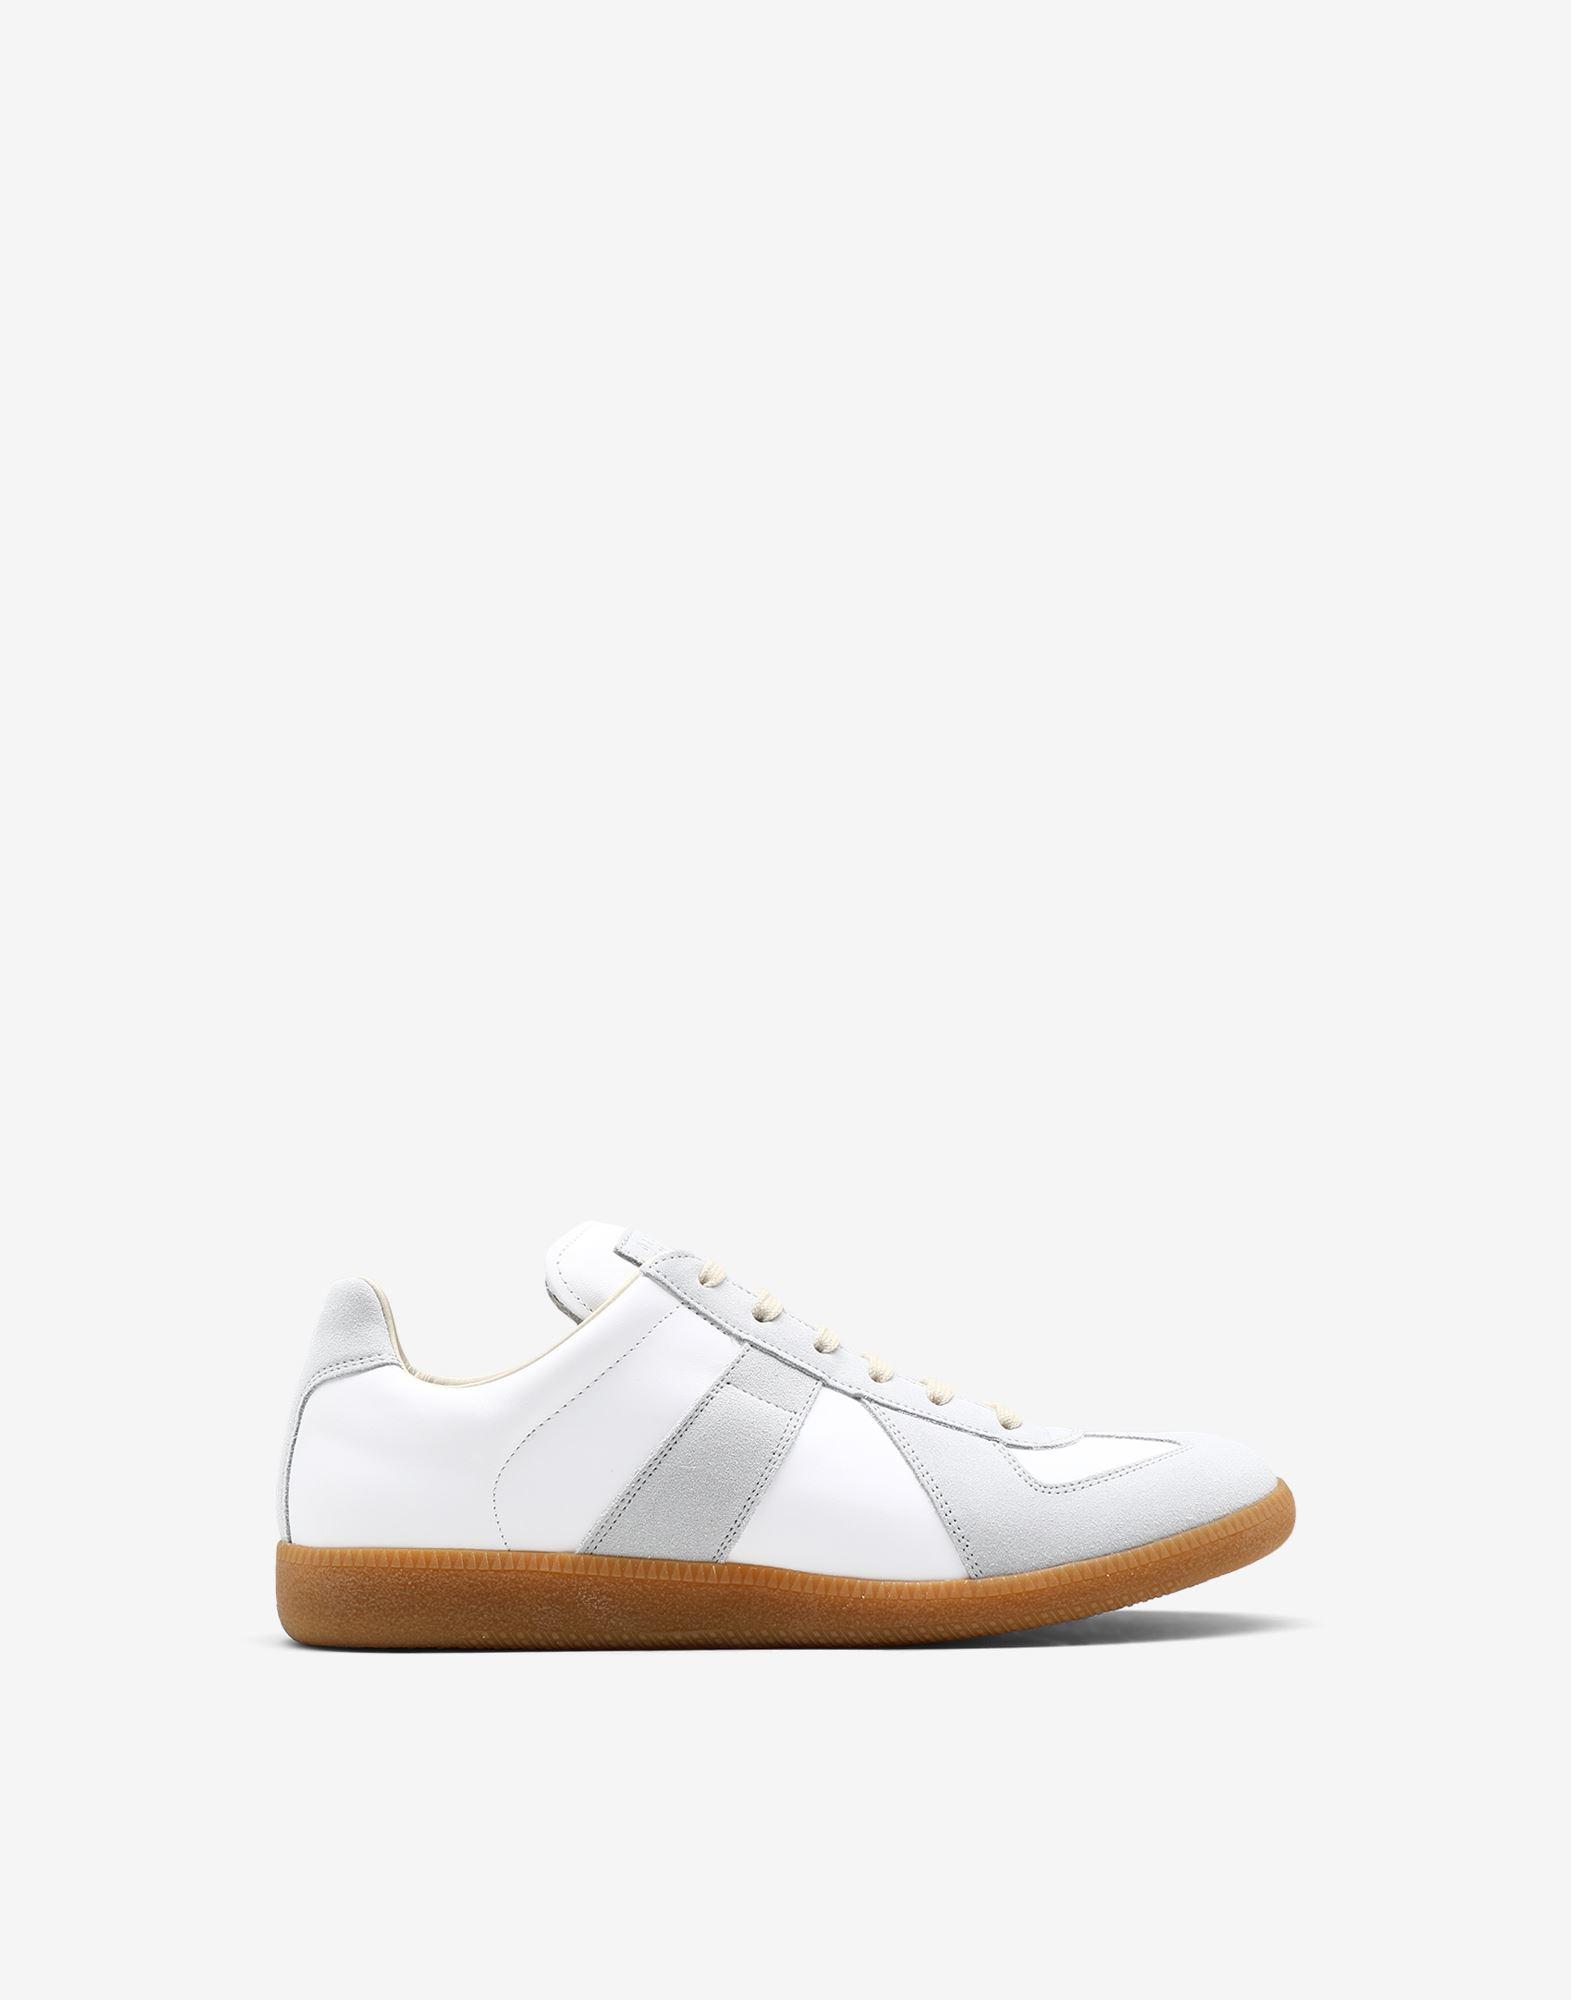 MAISON MARGIELA Calfskin 'Replica' sneakers Sneakers Man f